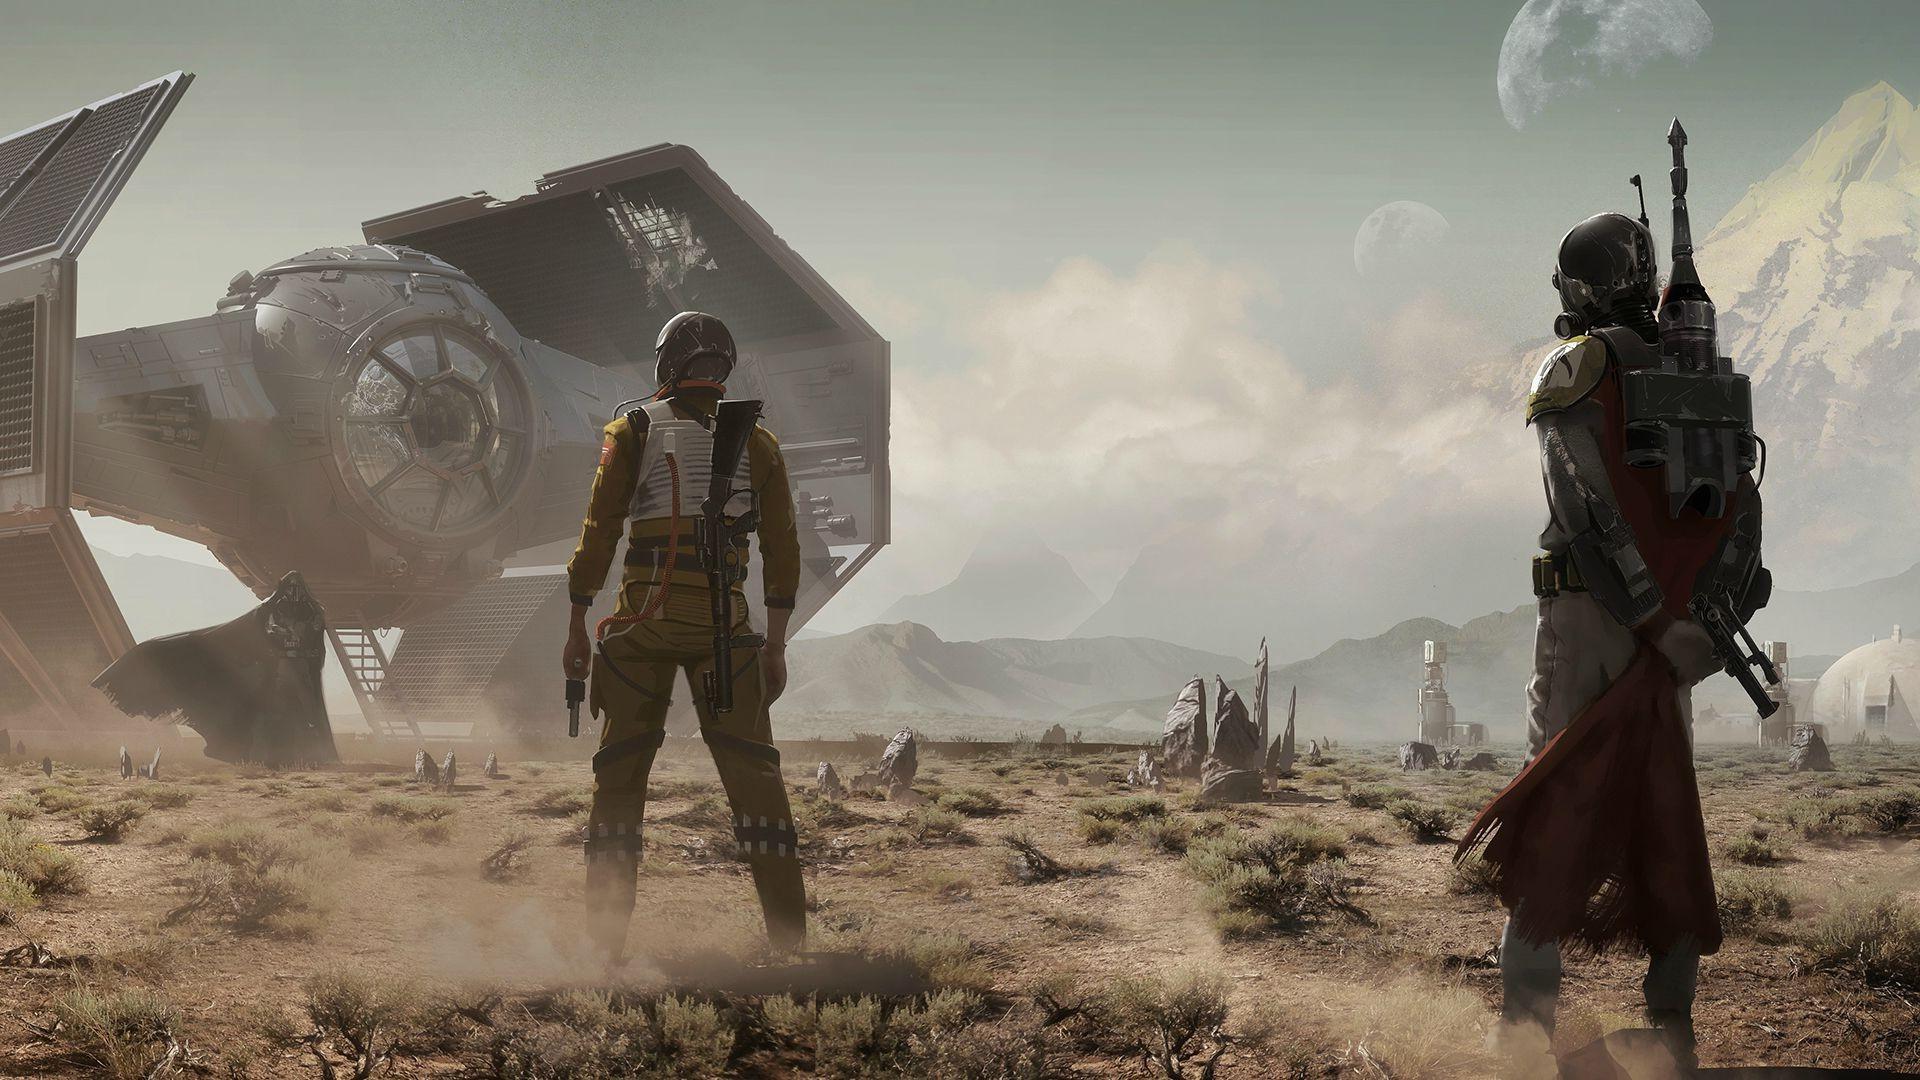 Star Wars, Mandalorians, TIE Advanced, Bounty Hunter Wallpapers HD